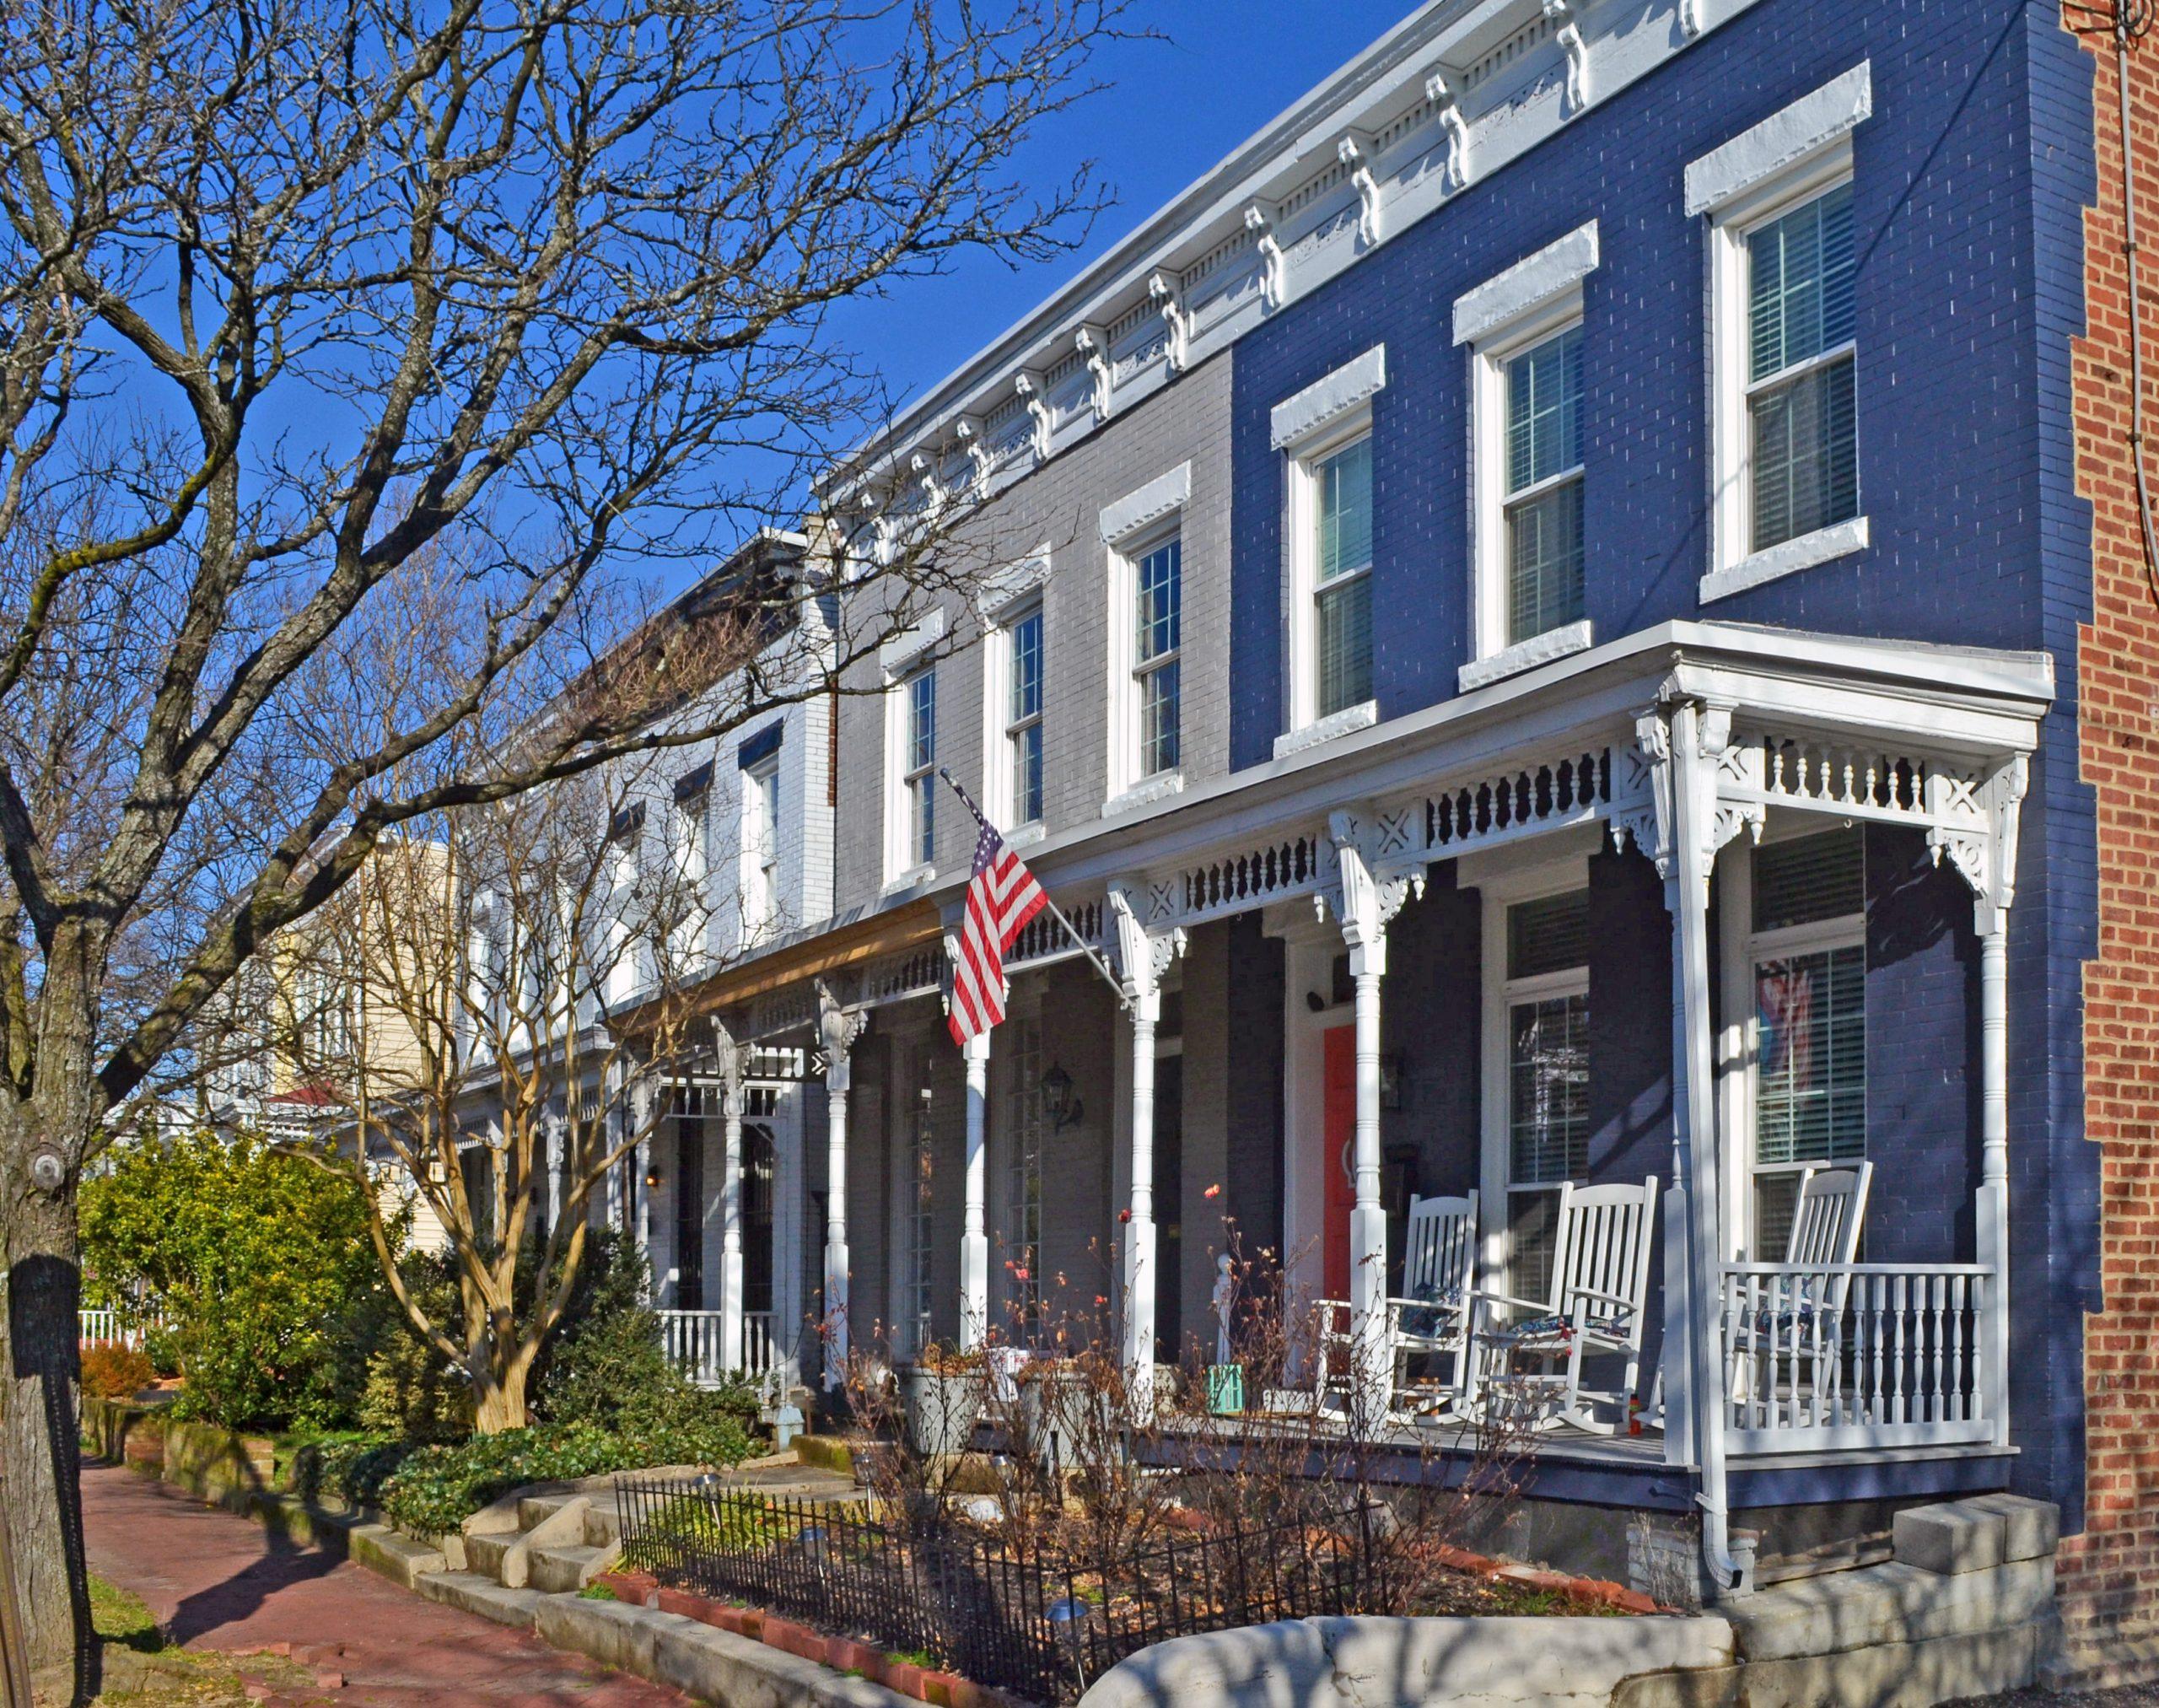 Fan Area Historic District Extension